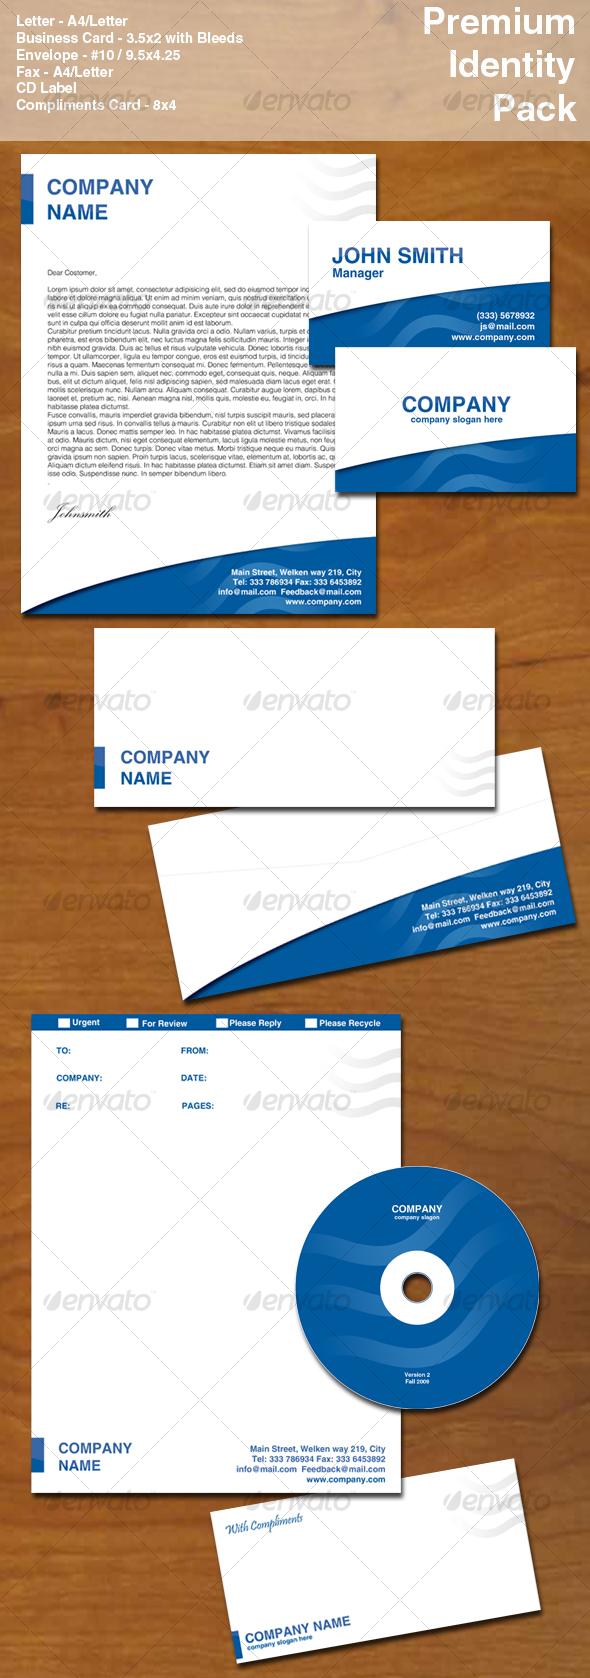 Premium ID Pack - Blue - Stationery Print Templates